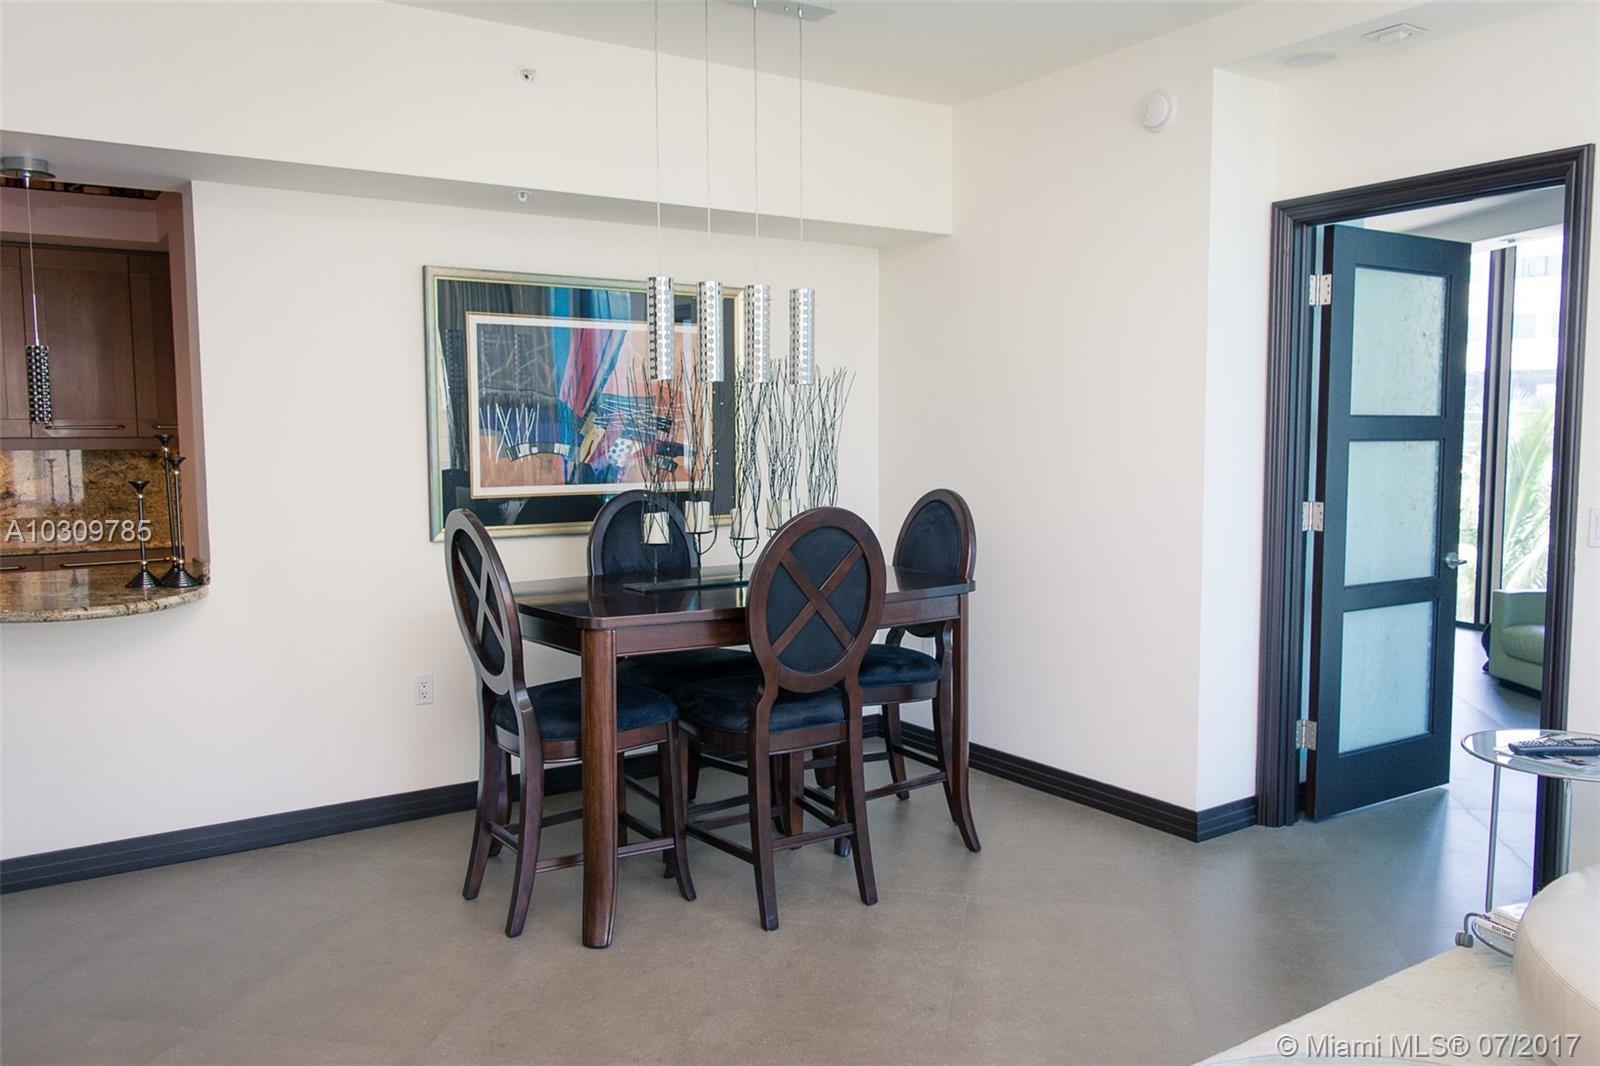 333 NE Las Olas Way # 1008, Fort Lauderdale , FL 33301